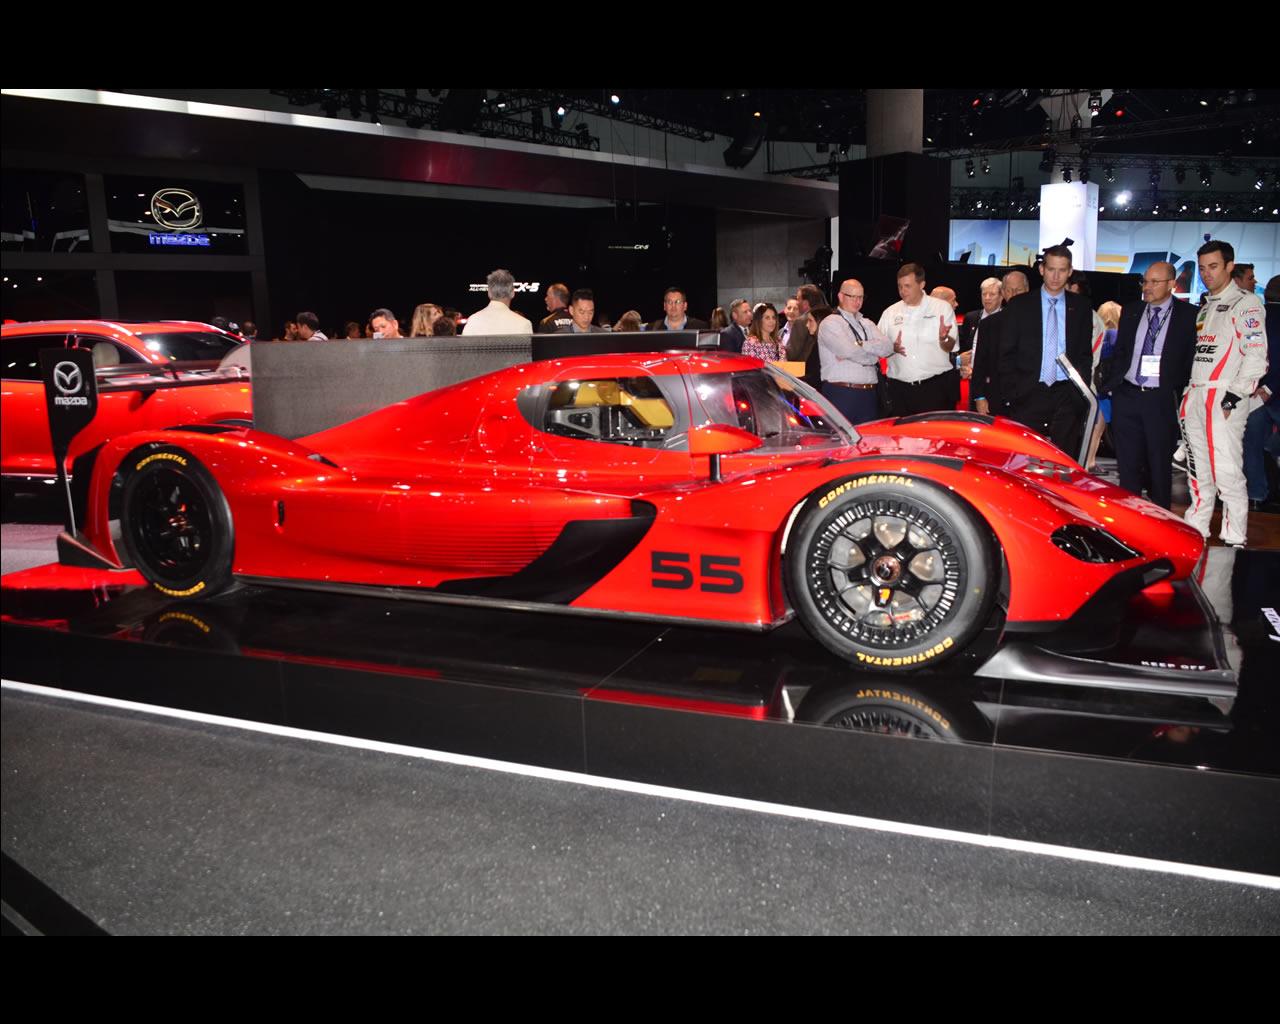 http://autoconcept-reviews.com/cars_reviews/mazda/mazda-rt24-p-imsa-dpi-race-car-for-2017/wallpaper/2%20-Mazda%20RT24-P%20race%20car.jpg